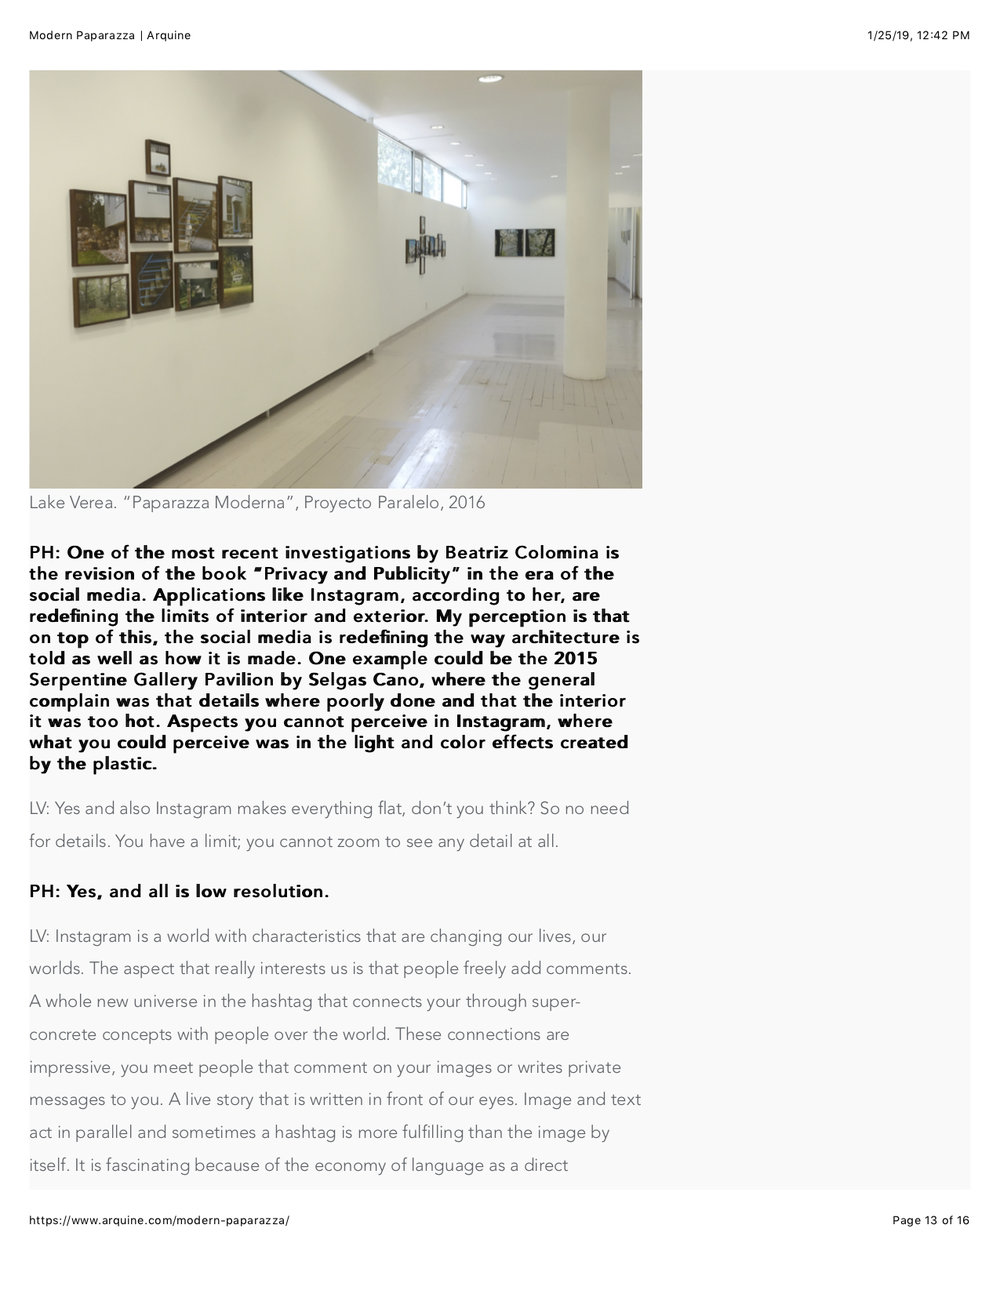 Modern Paparazza | Arquine.13.jpg